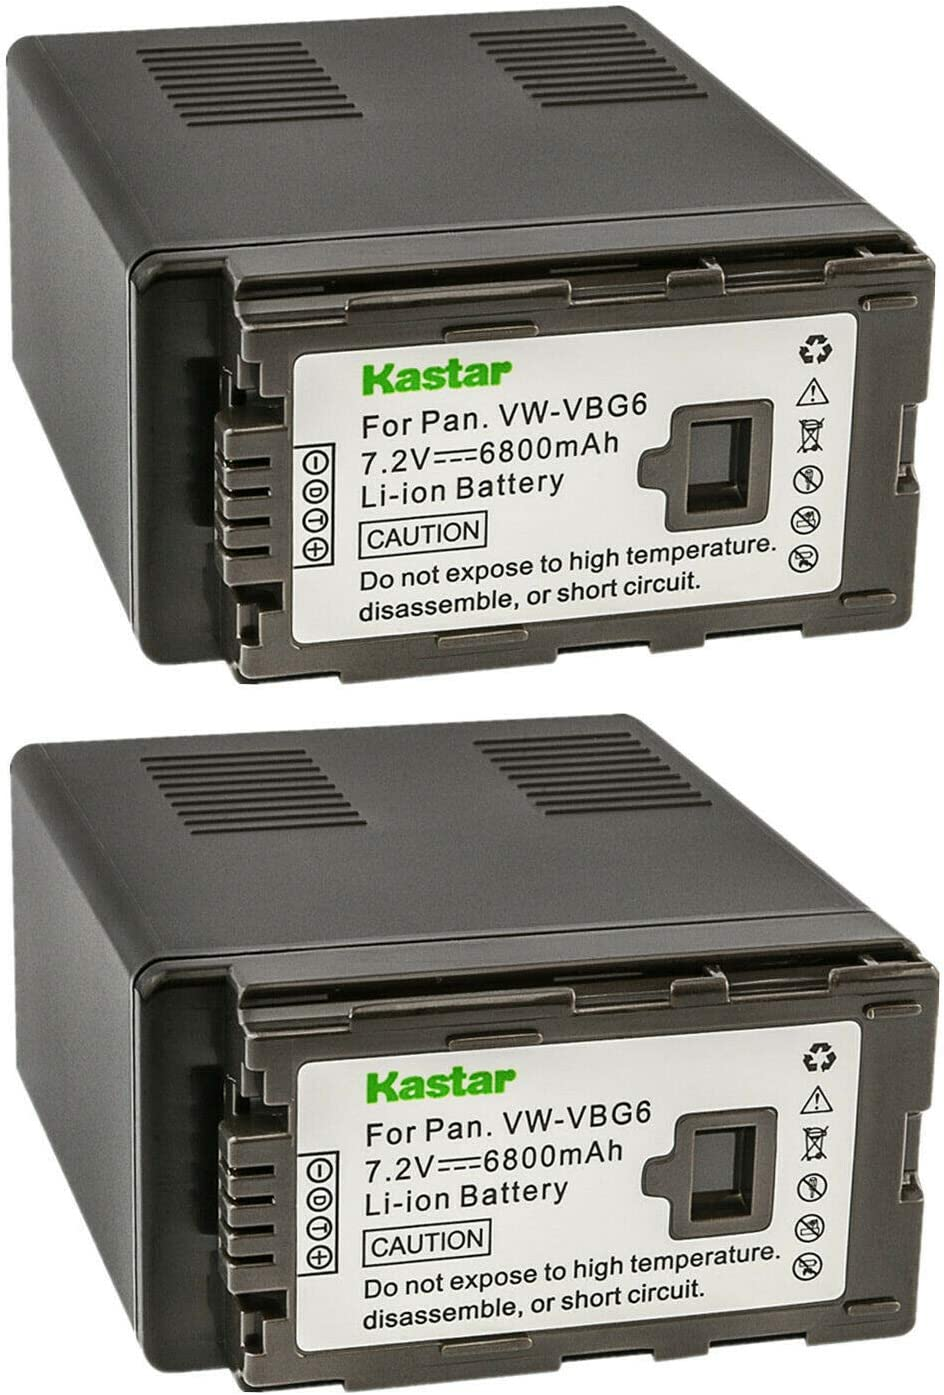 SDHC 2 Pack Panasonic VDR-D51 Camcorder Memory Card 2 x 8GB Secure Digital High Capacity Memory Cards